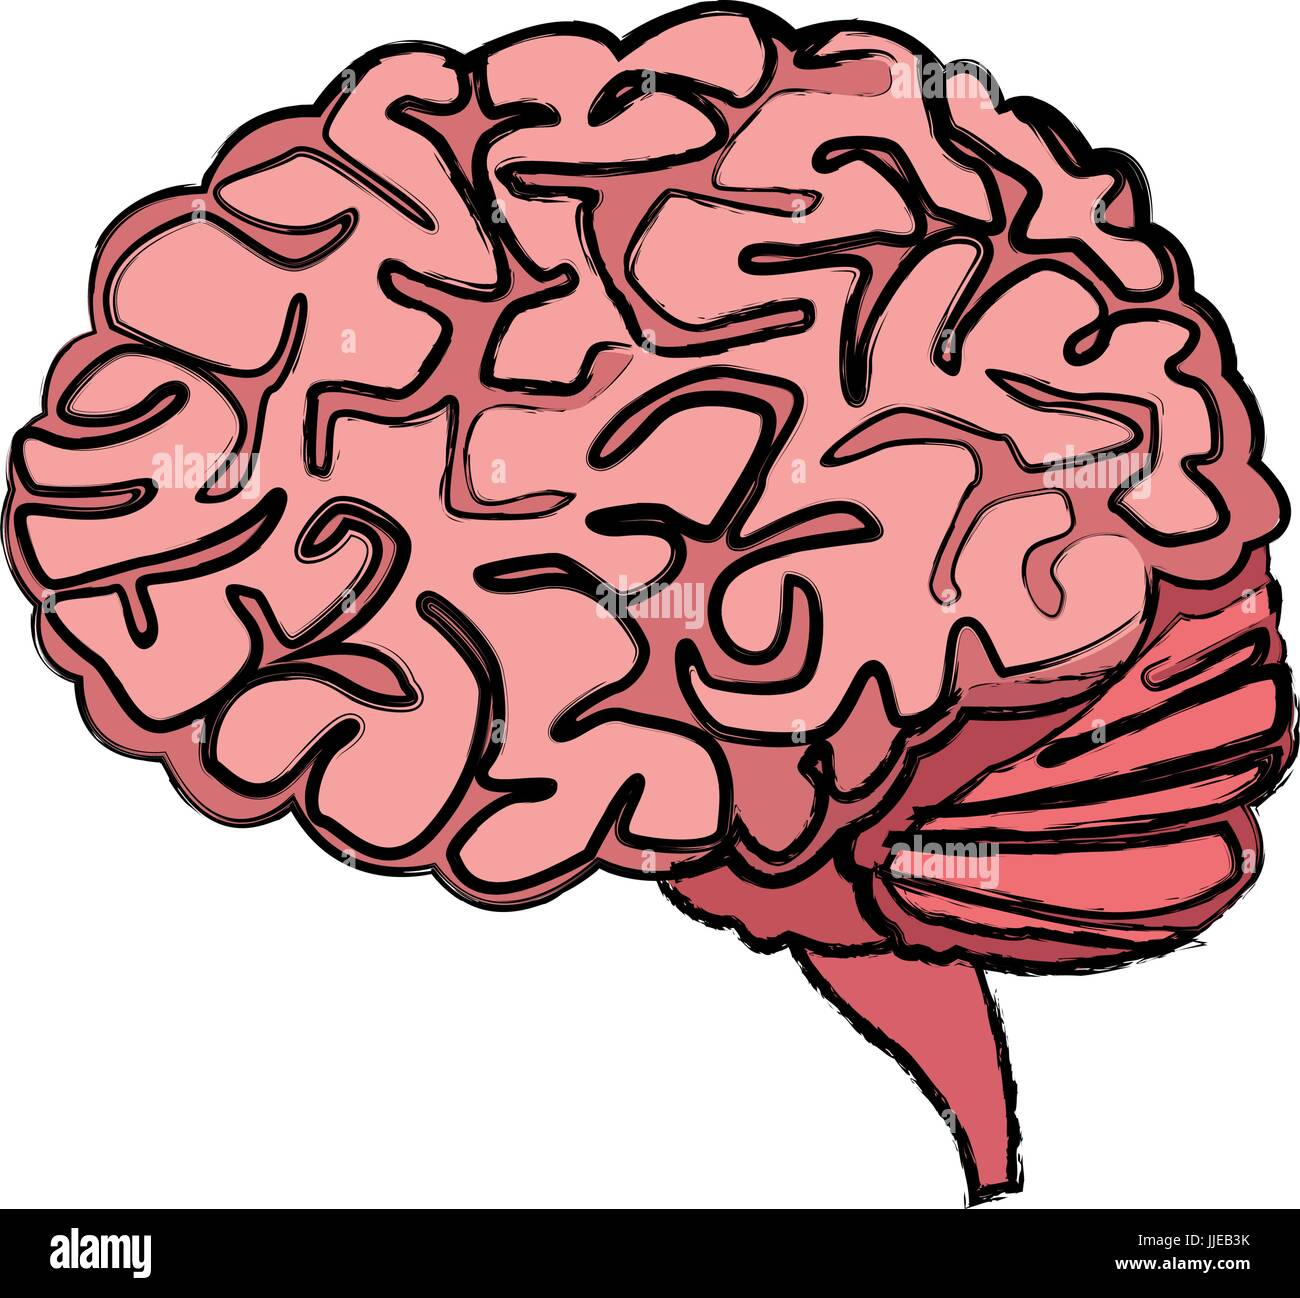 Brain Lobes Stockfotos & Brain Lobes Bilder - Alamy